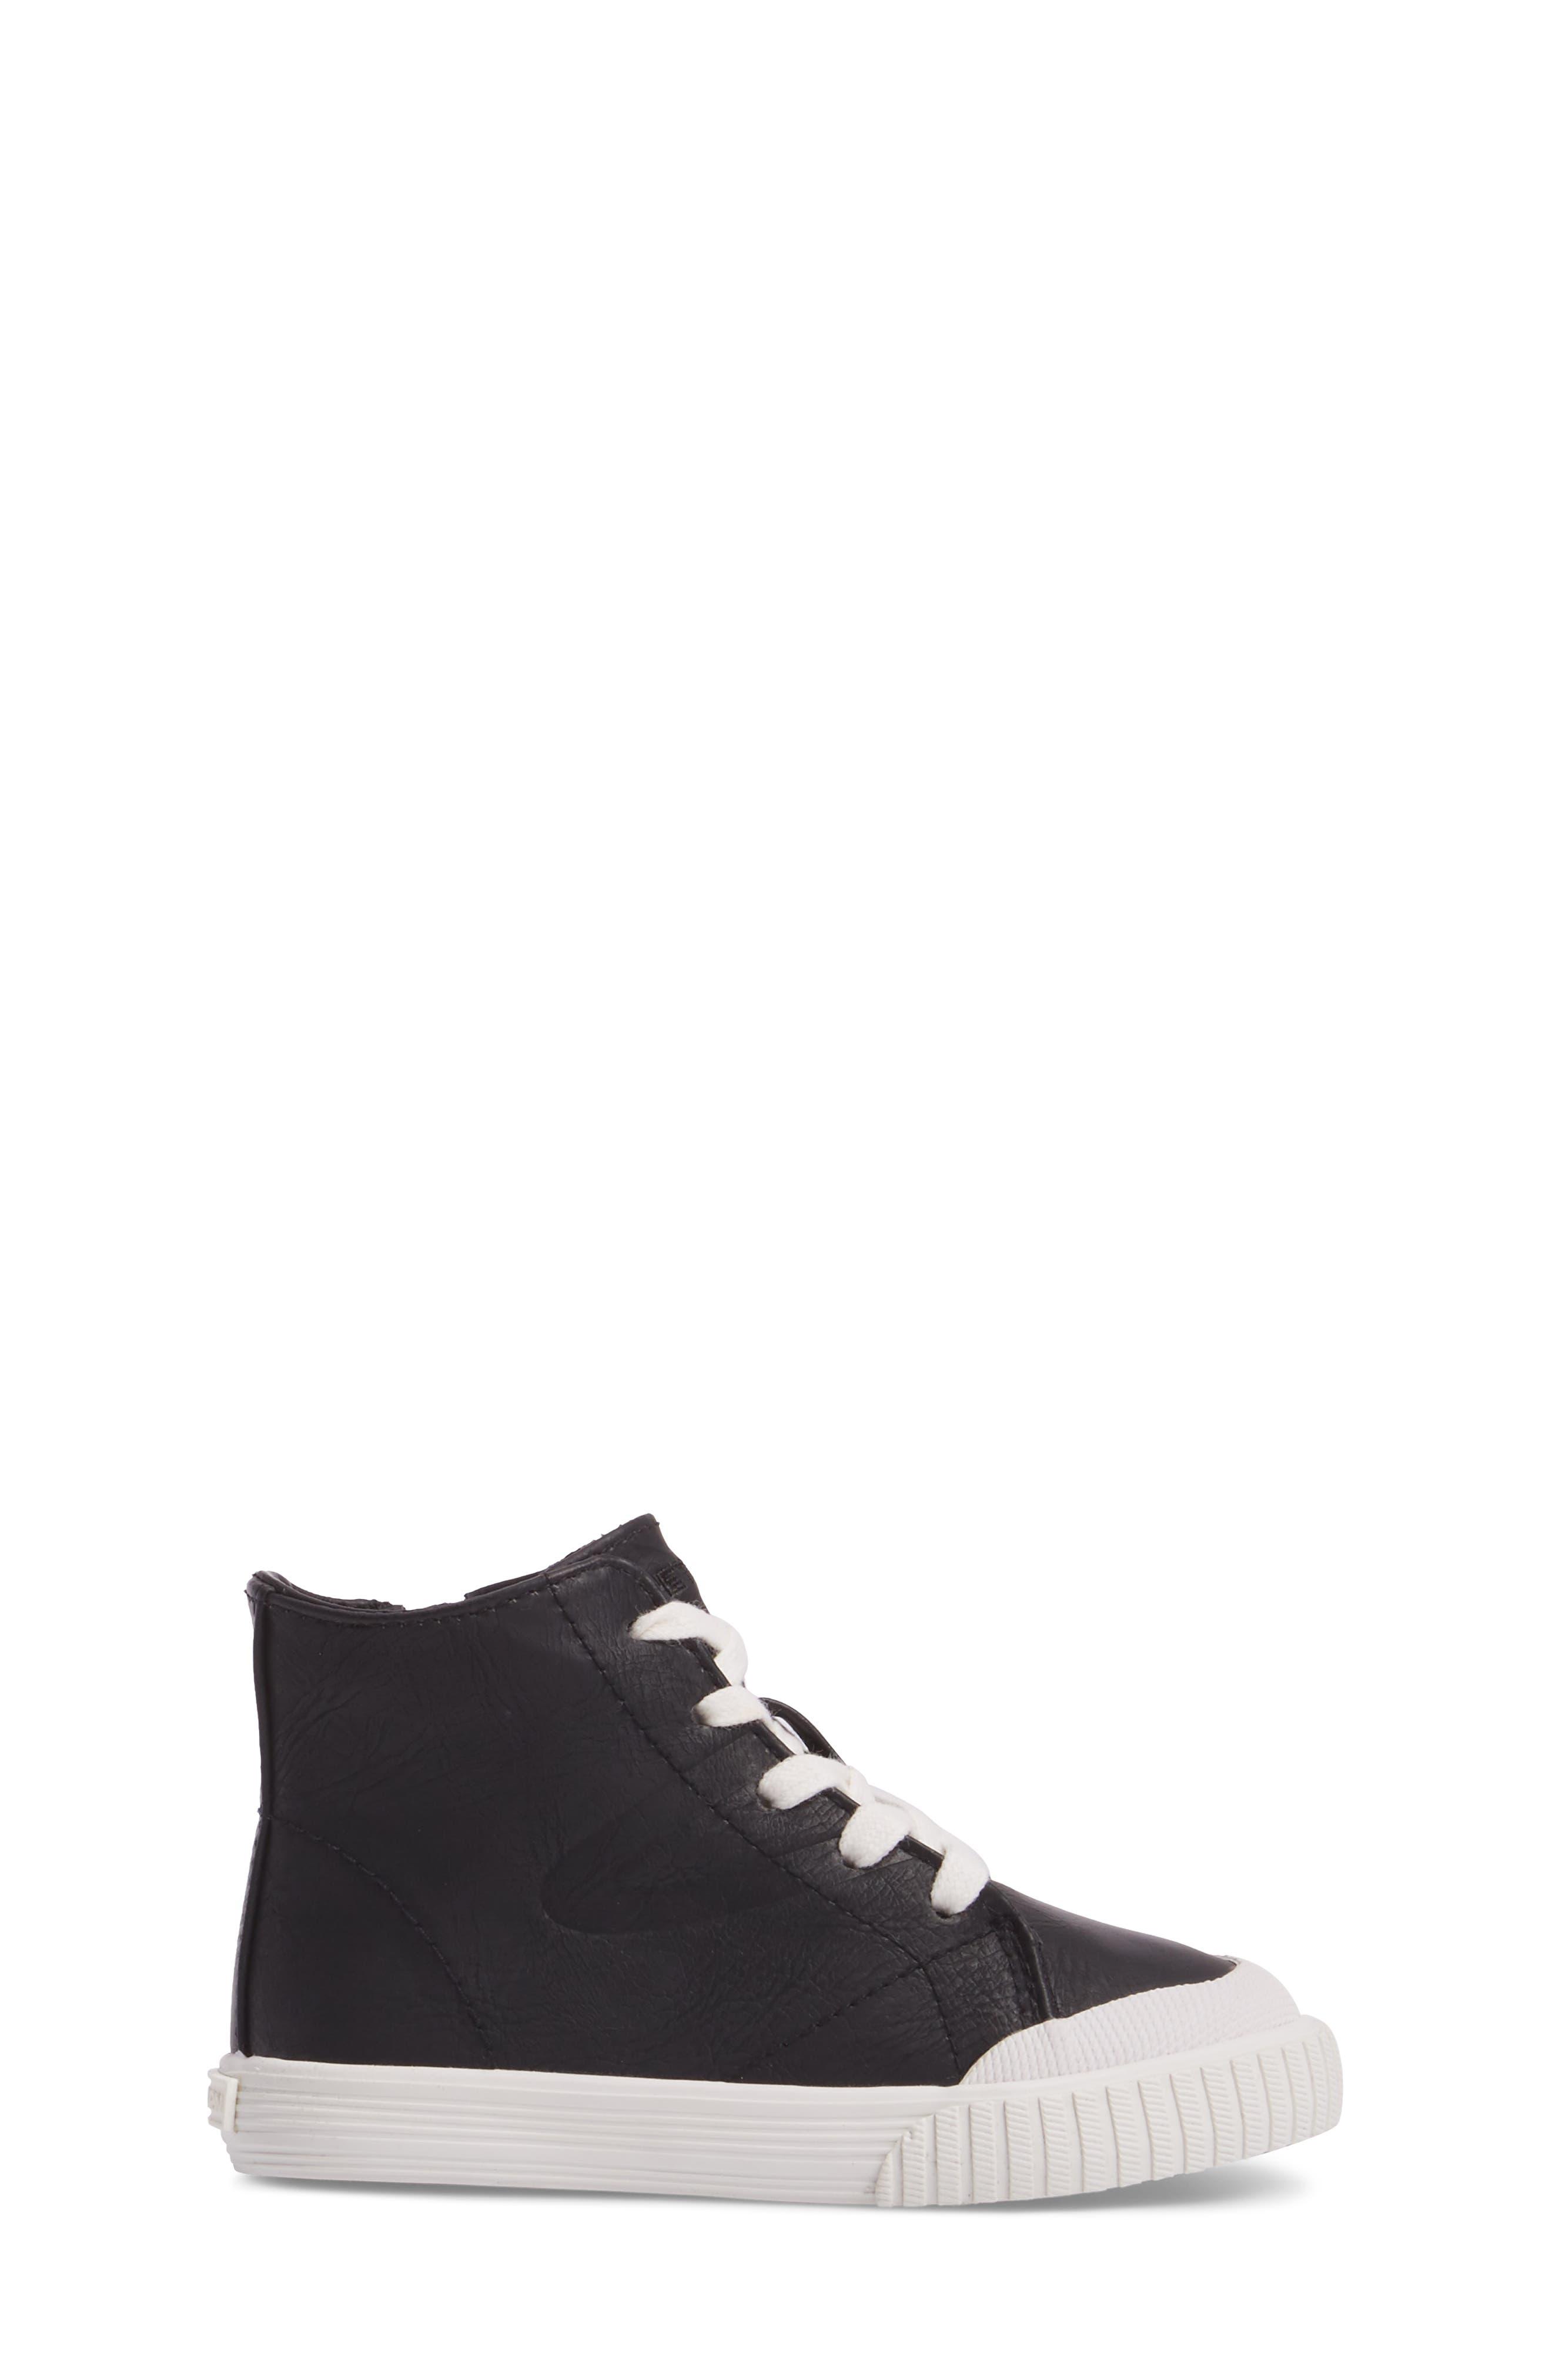 Marley High Top Sneaker,                             Alternate thumbnail 7, color,